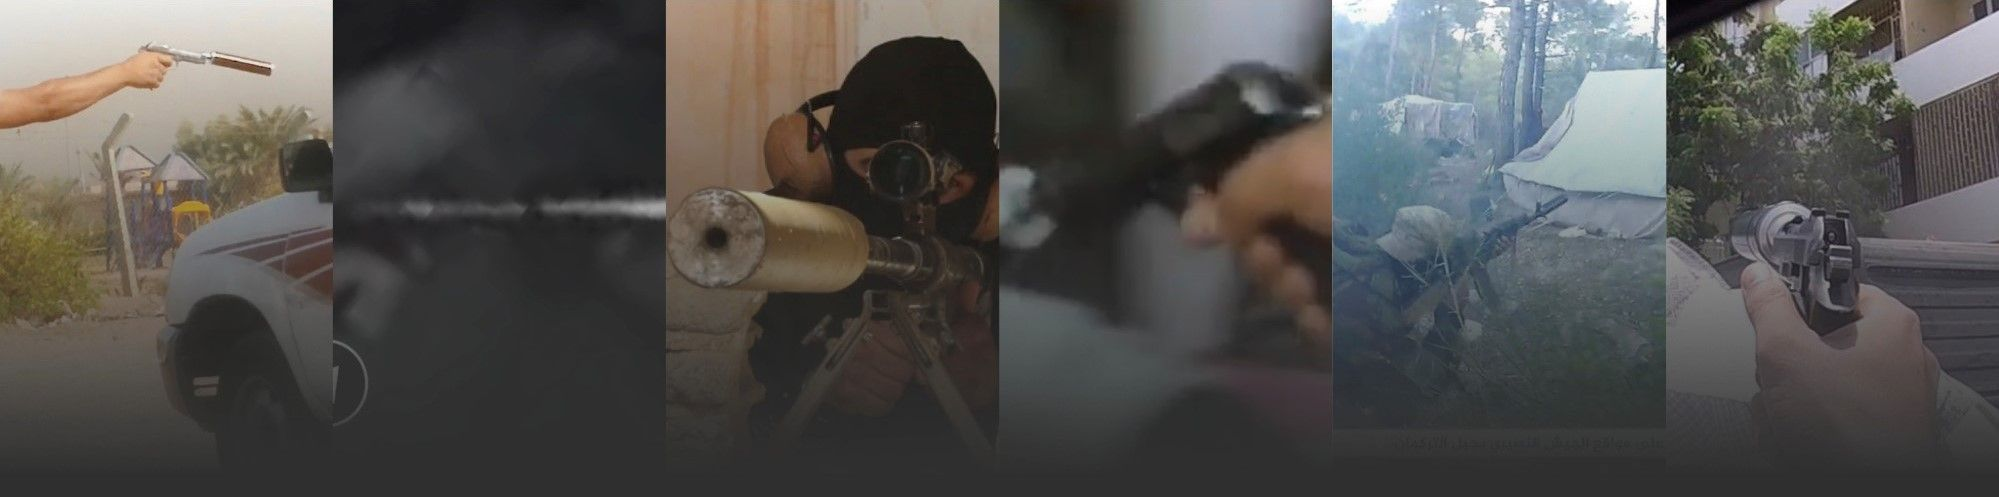 Keeping it Quiet: Suppressor Use by Jihadis, Militants & More